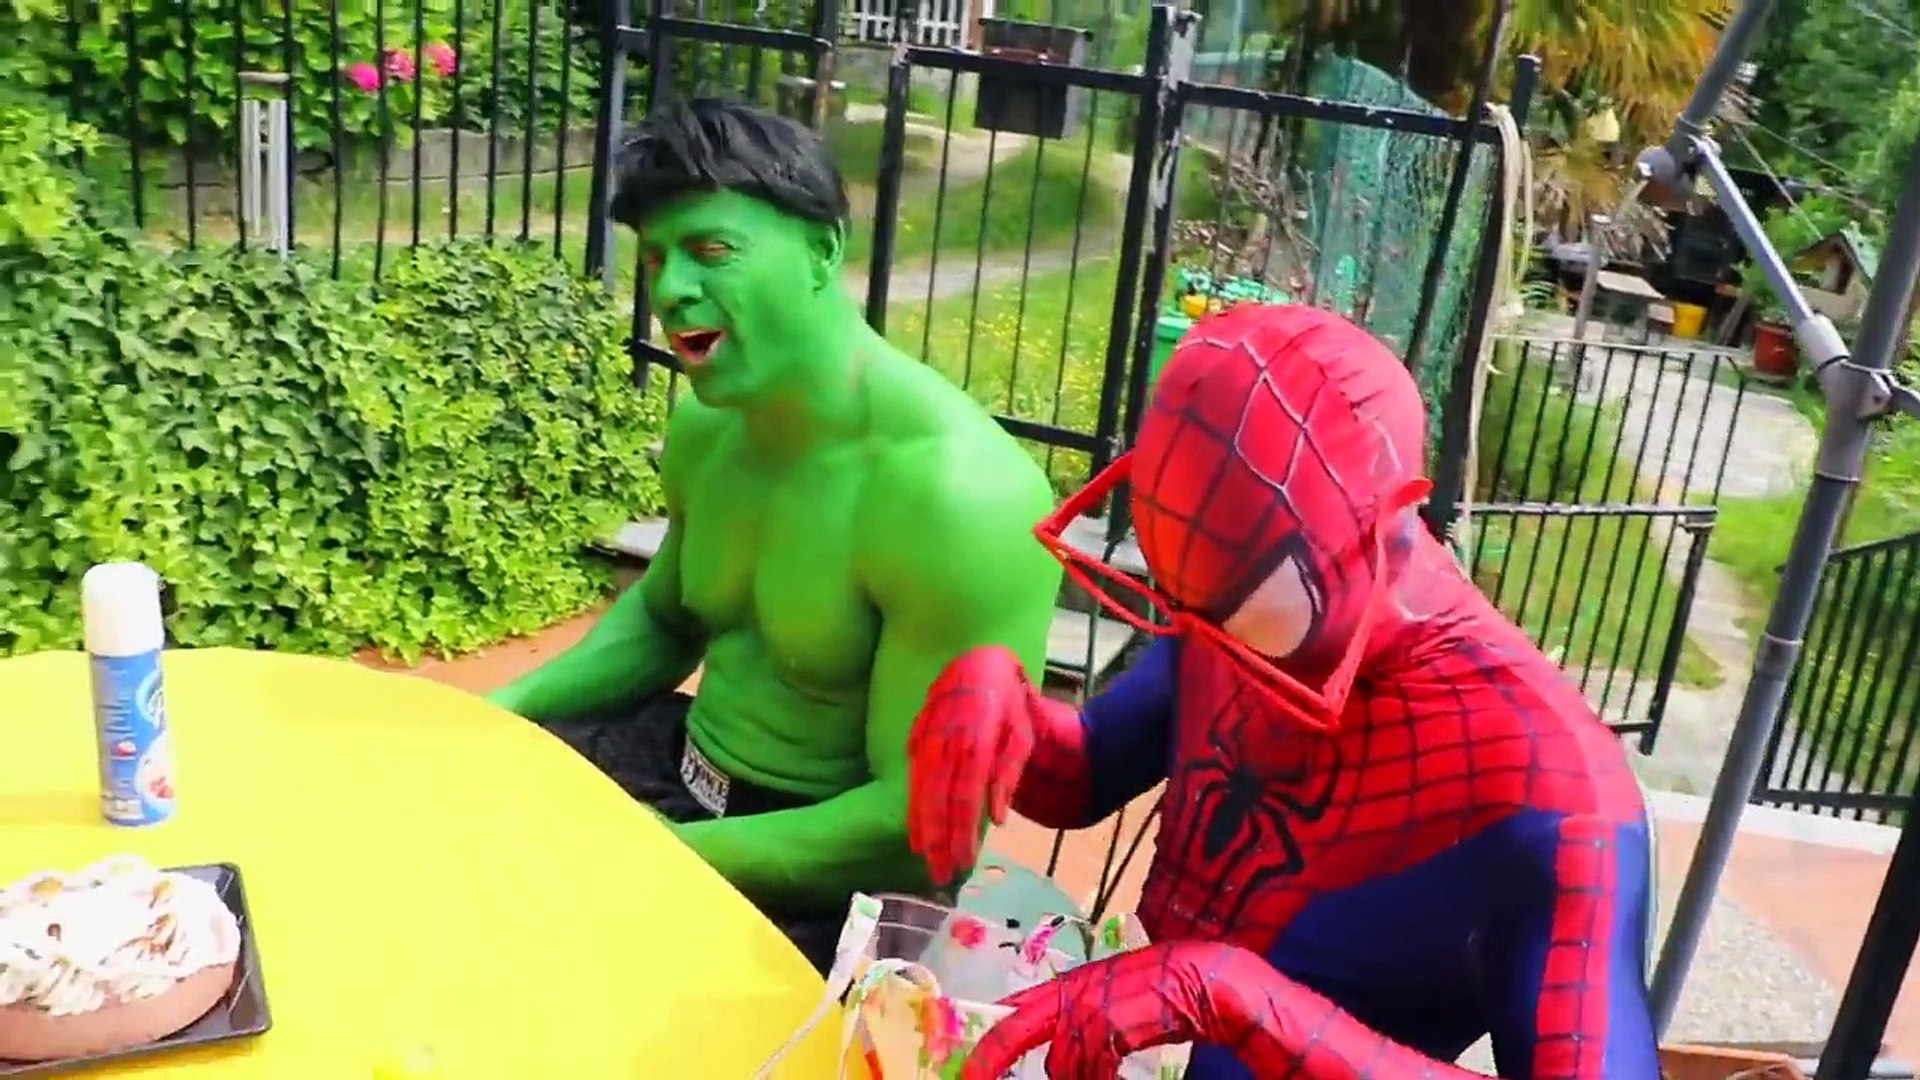 Hulk fica um buraco na barriga! w Spiderman, Elsa Frozen, Lady Hulk, Venom, Joker & de doces